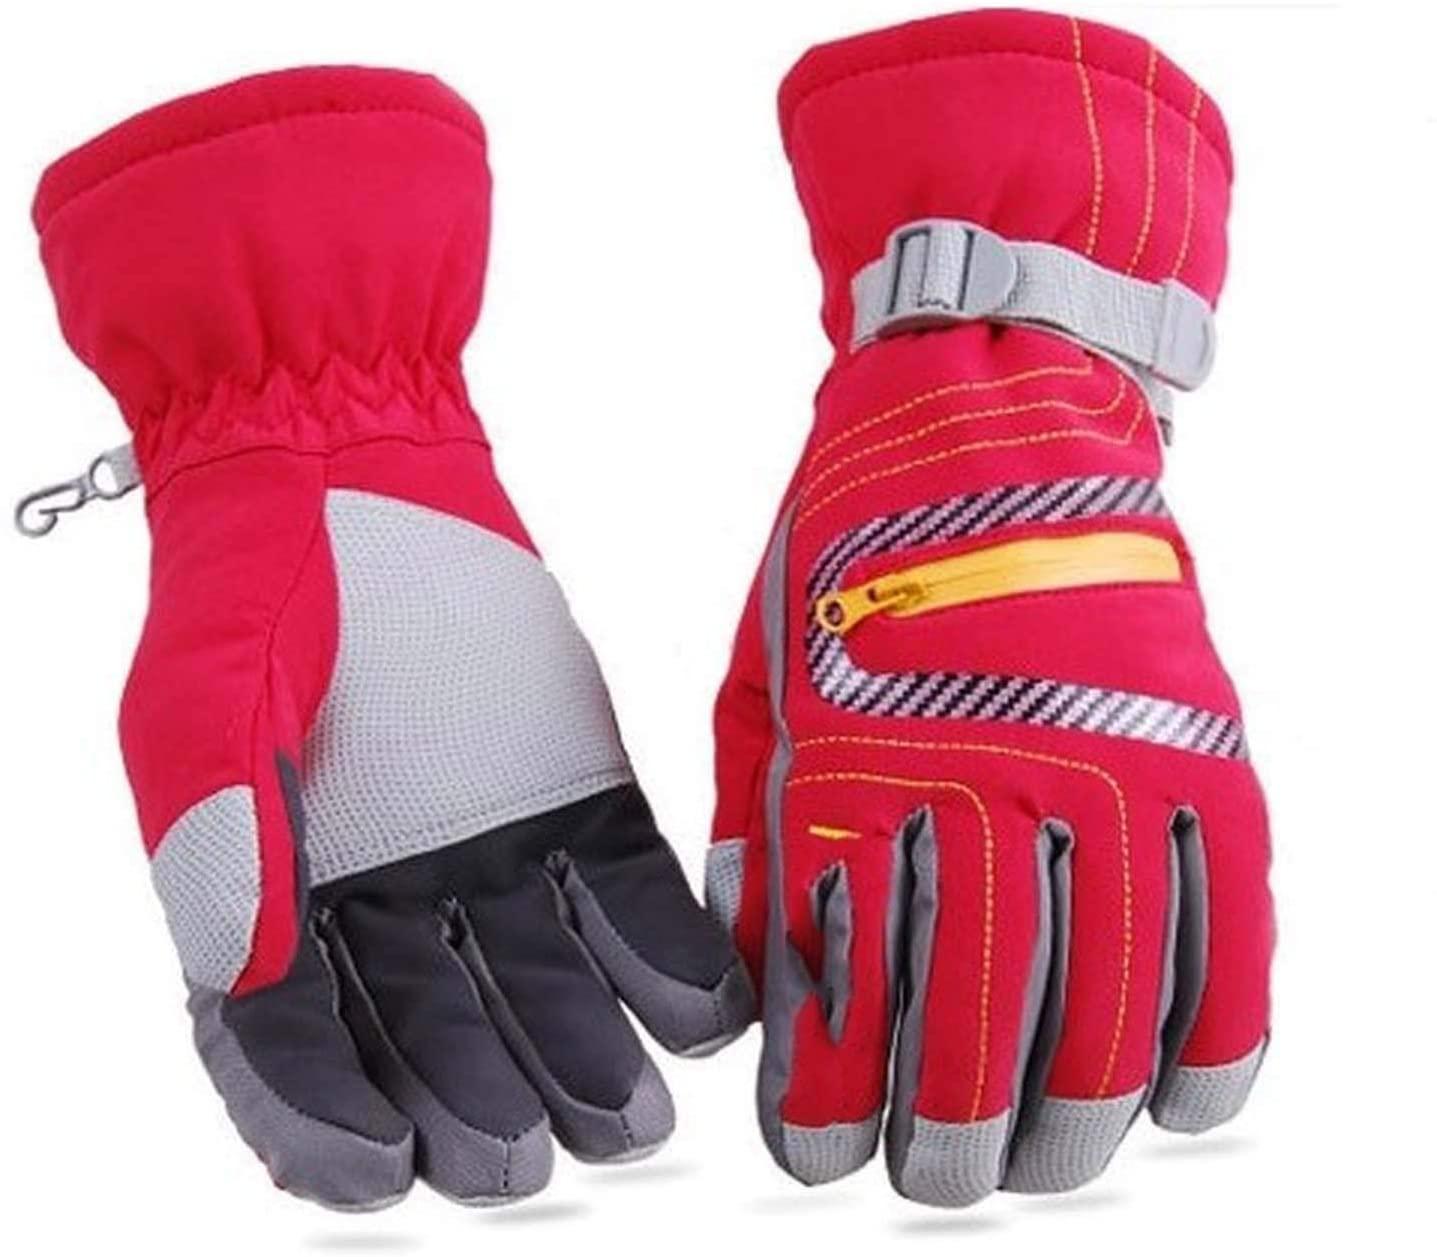 YR5V4V Ski Gloves Waterproof Thermal Heated Gloves Snowboard Snowmobile Gloves Men Women Gloves Snowboarding Skiing Gloves,Red,XL